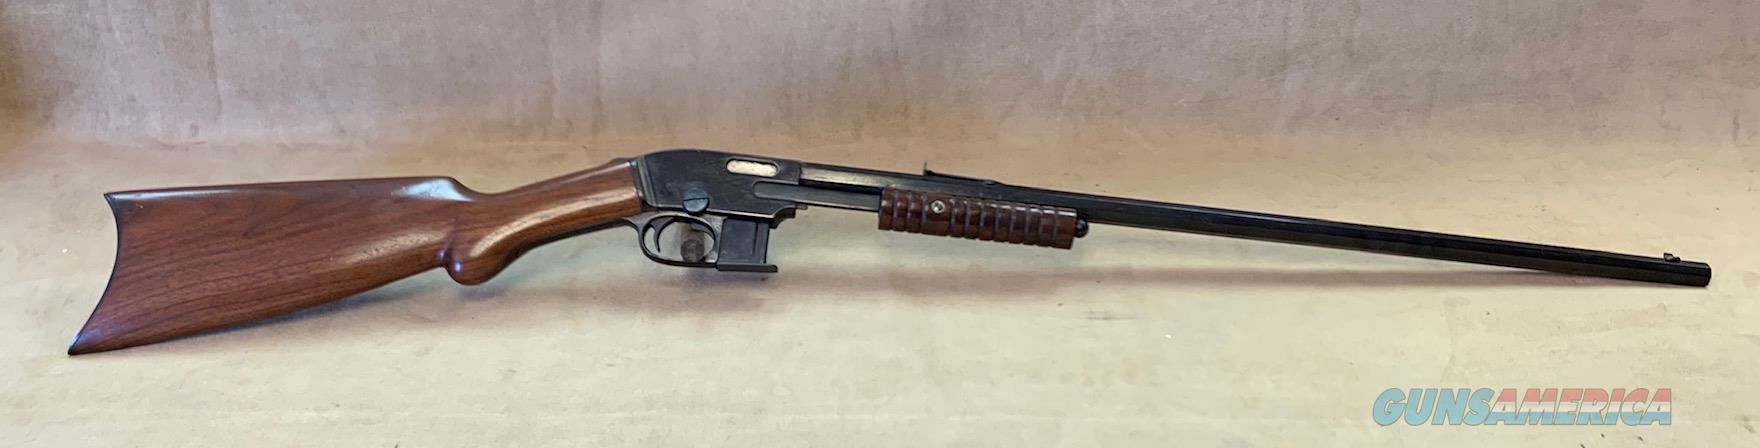 Savage 1903 Pump 22 S/L/LR Consignment  Guns > Rifles > Savage Rifles > Rimfire